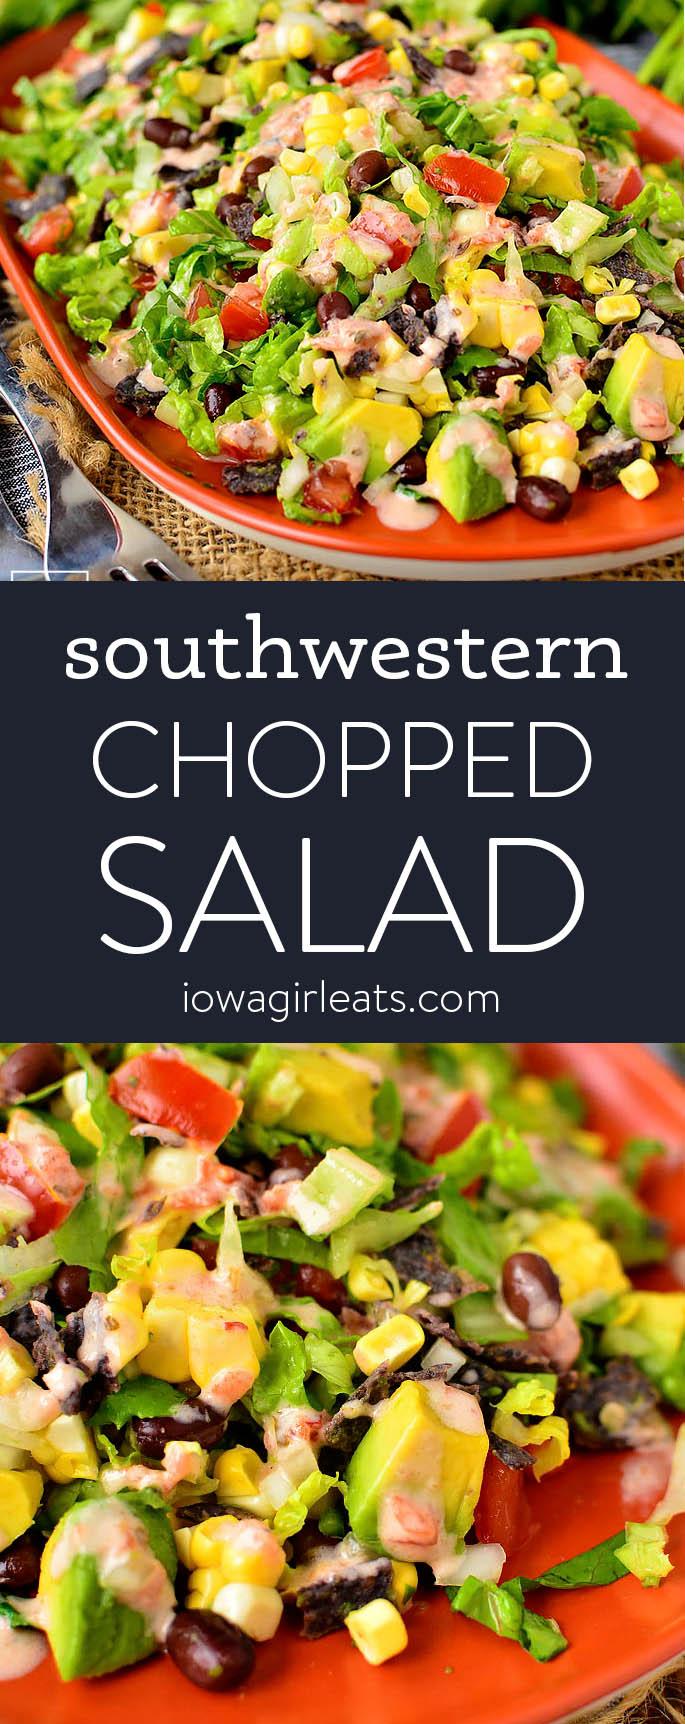 Photo collage of southwestern chopped salad